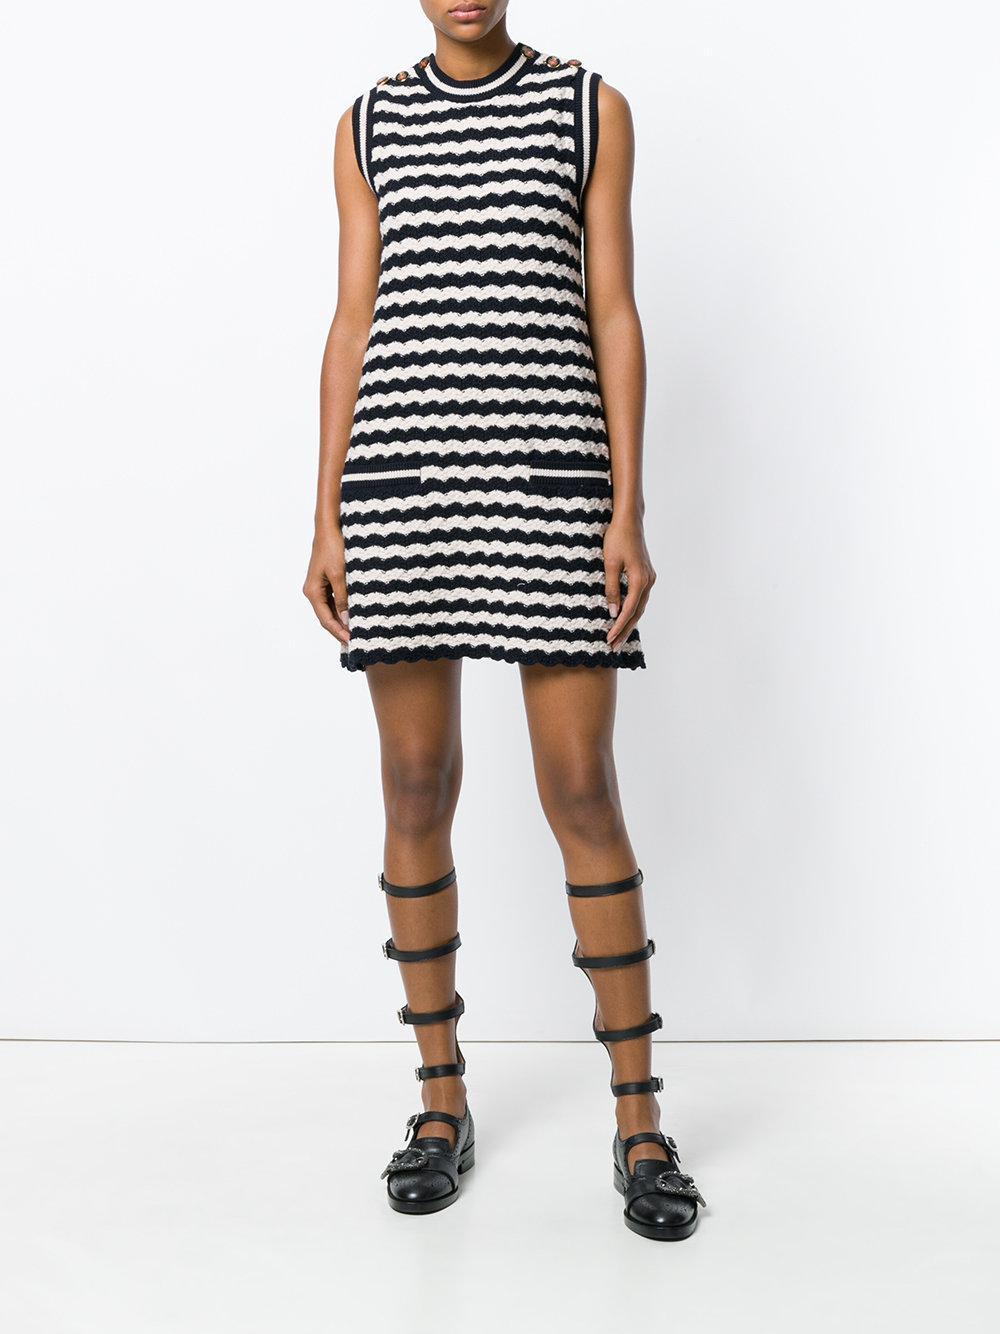 3eecfc35dff6f Lyst - Gucci Striped Knit Sleeveless Dress in Blue